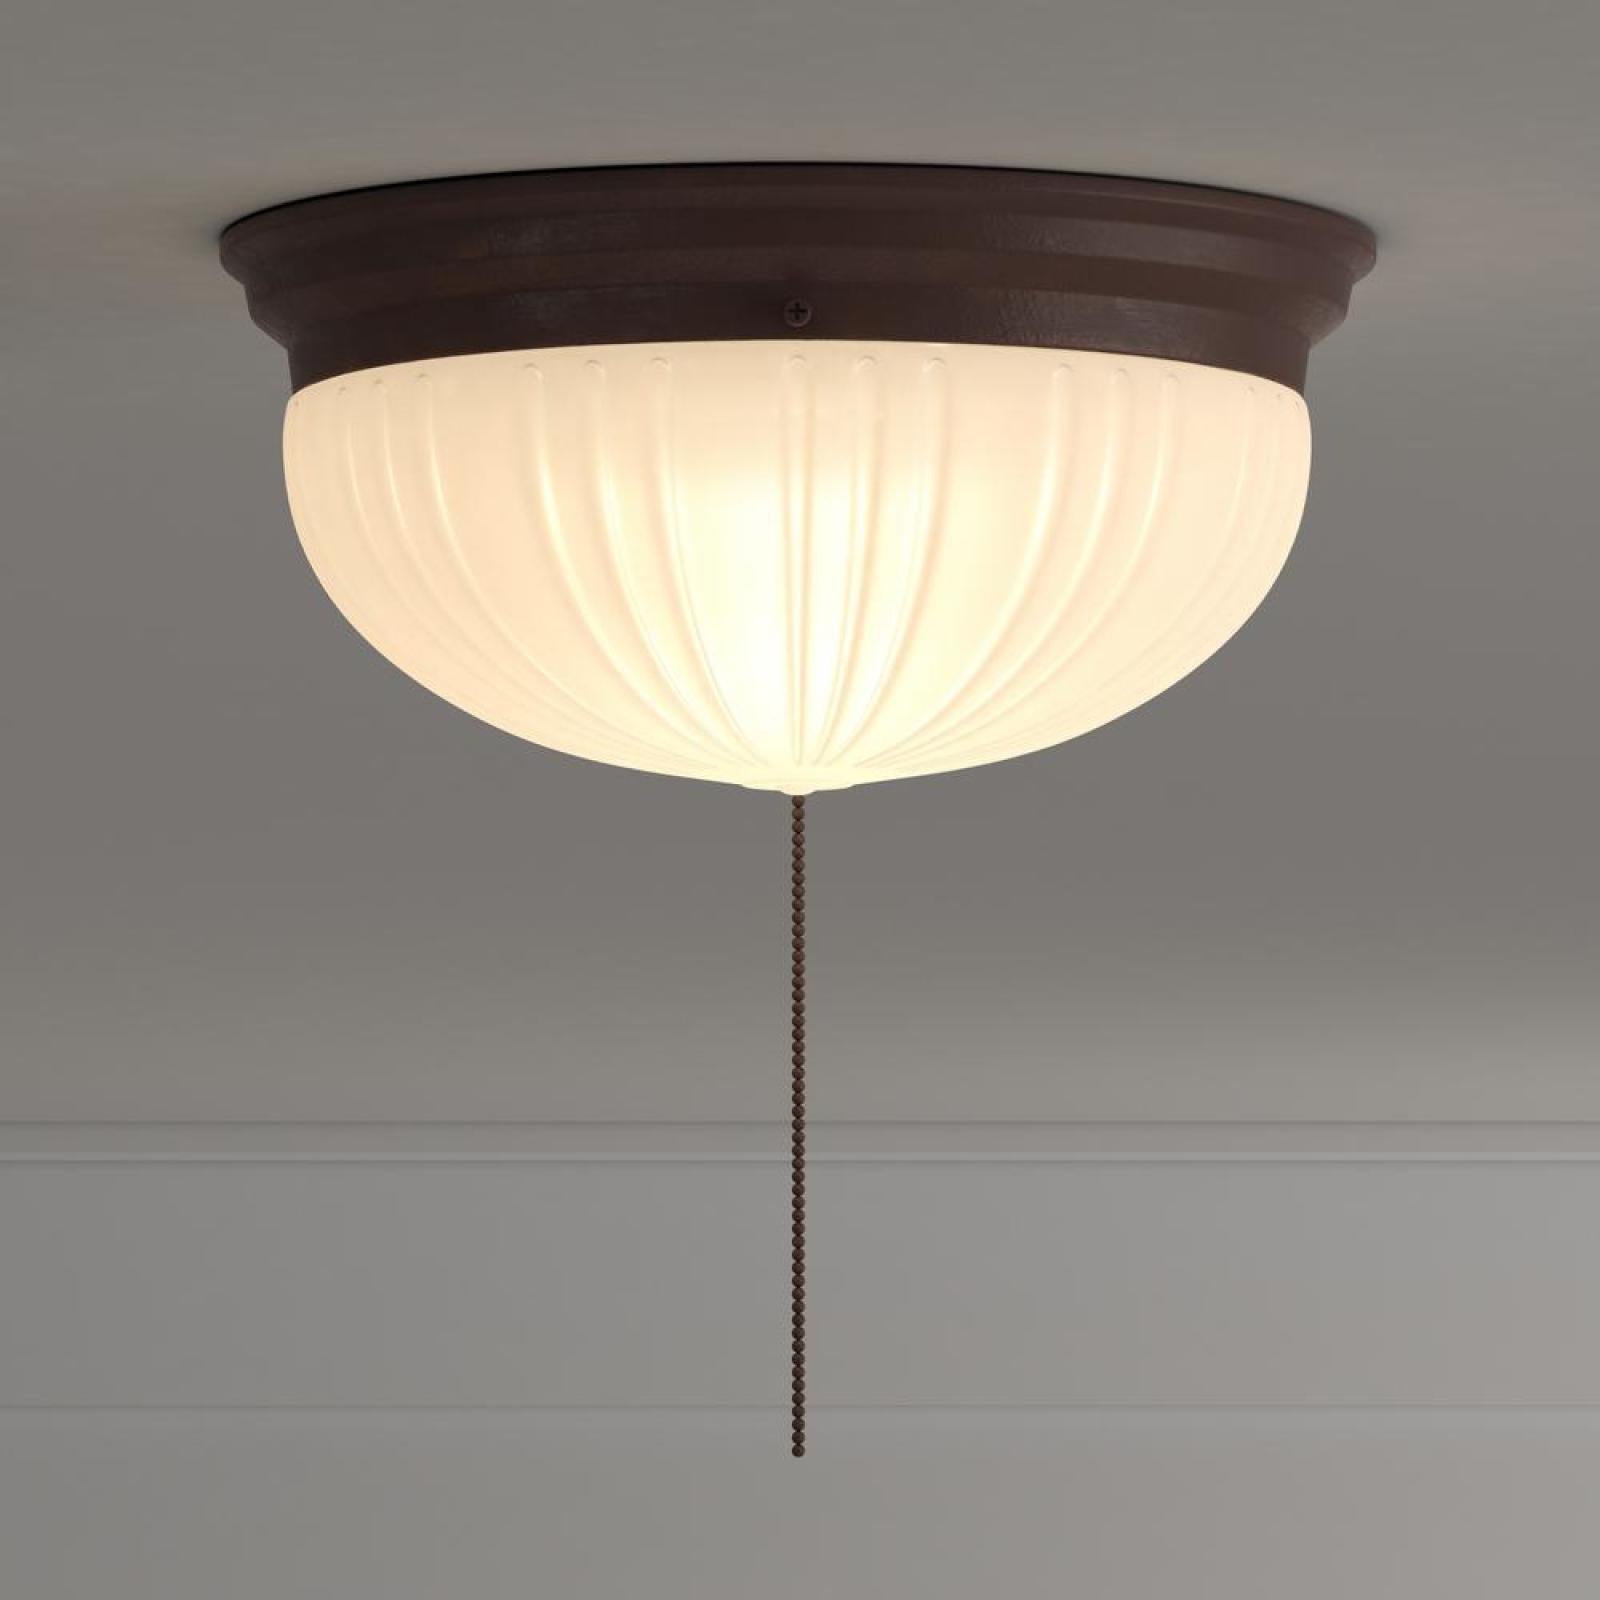 Light Ceiling Fixture Sienna Interior